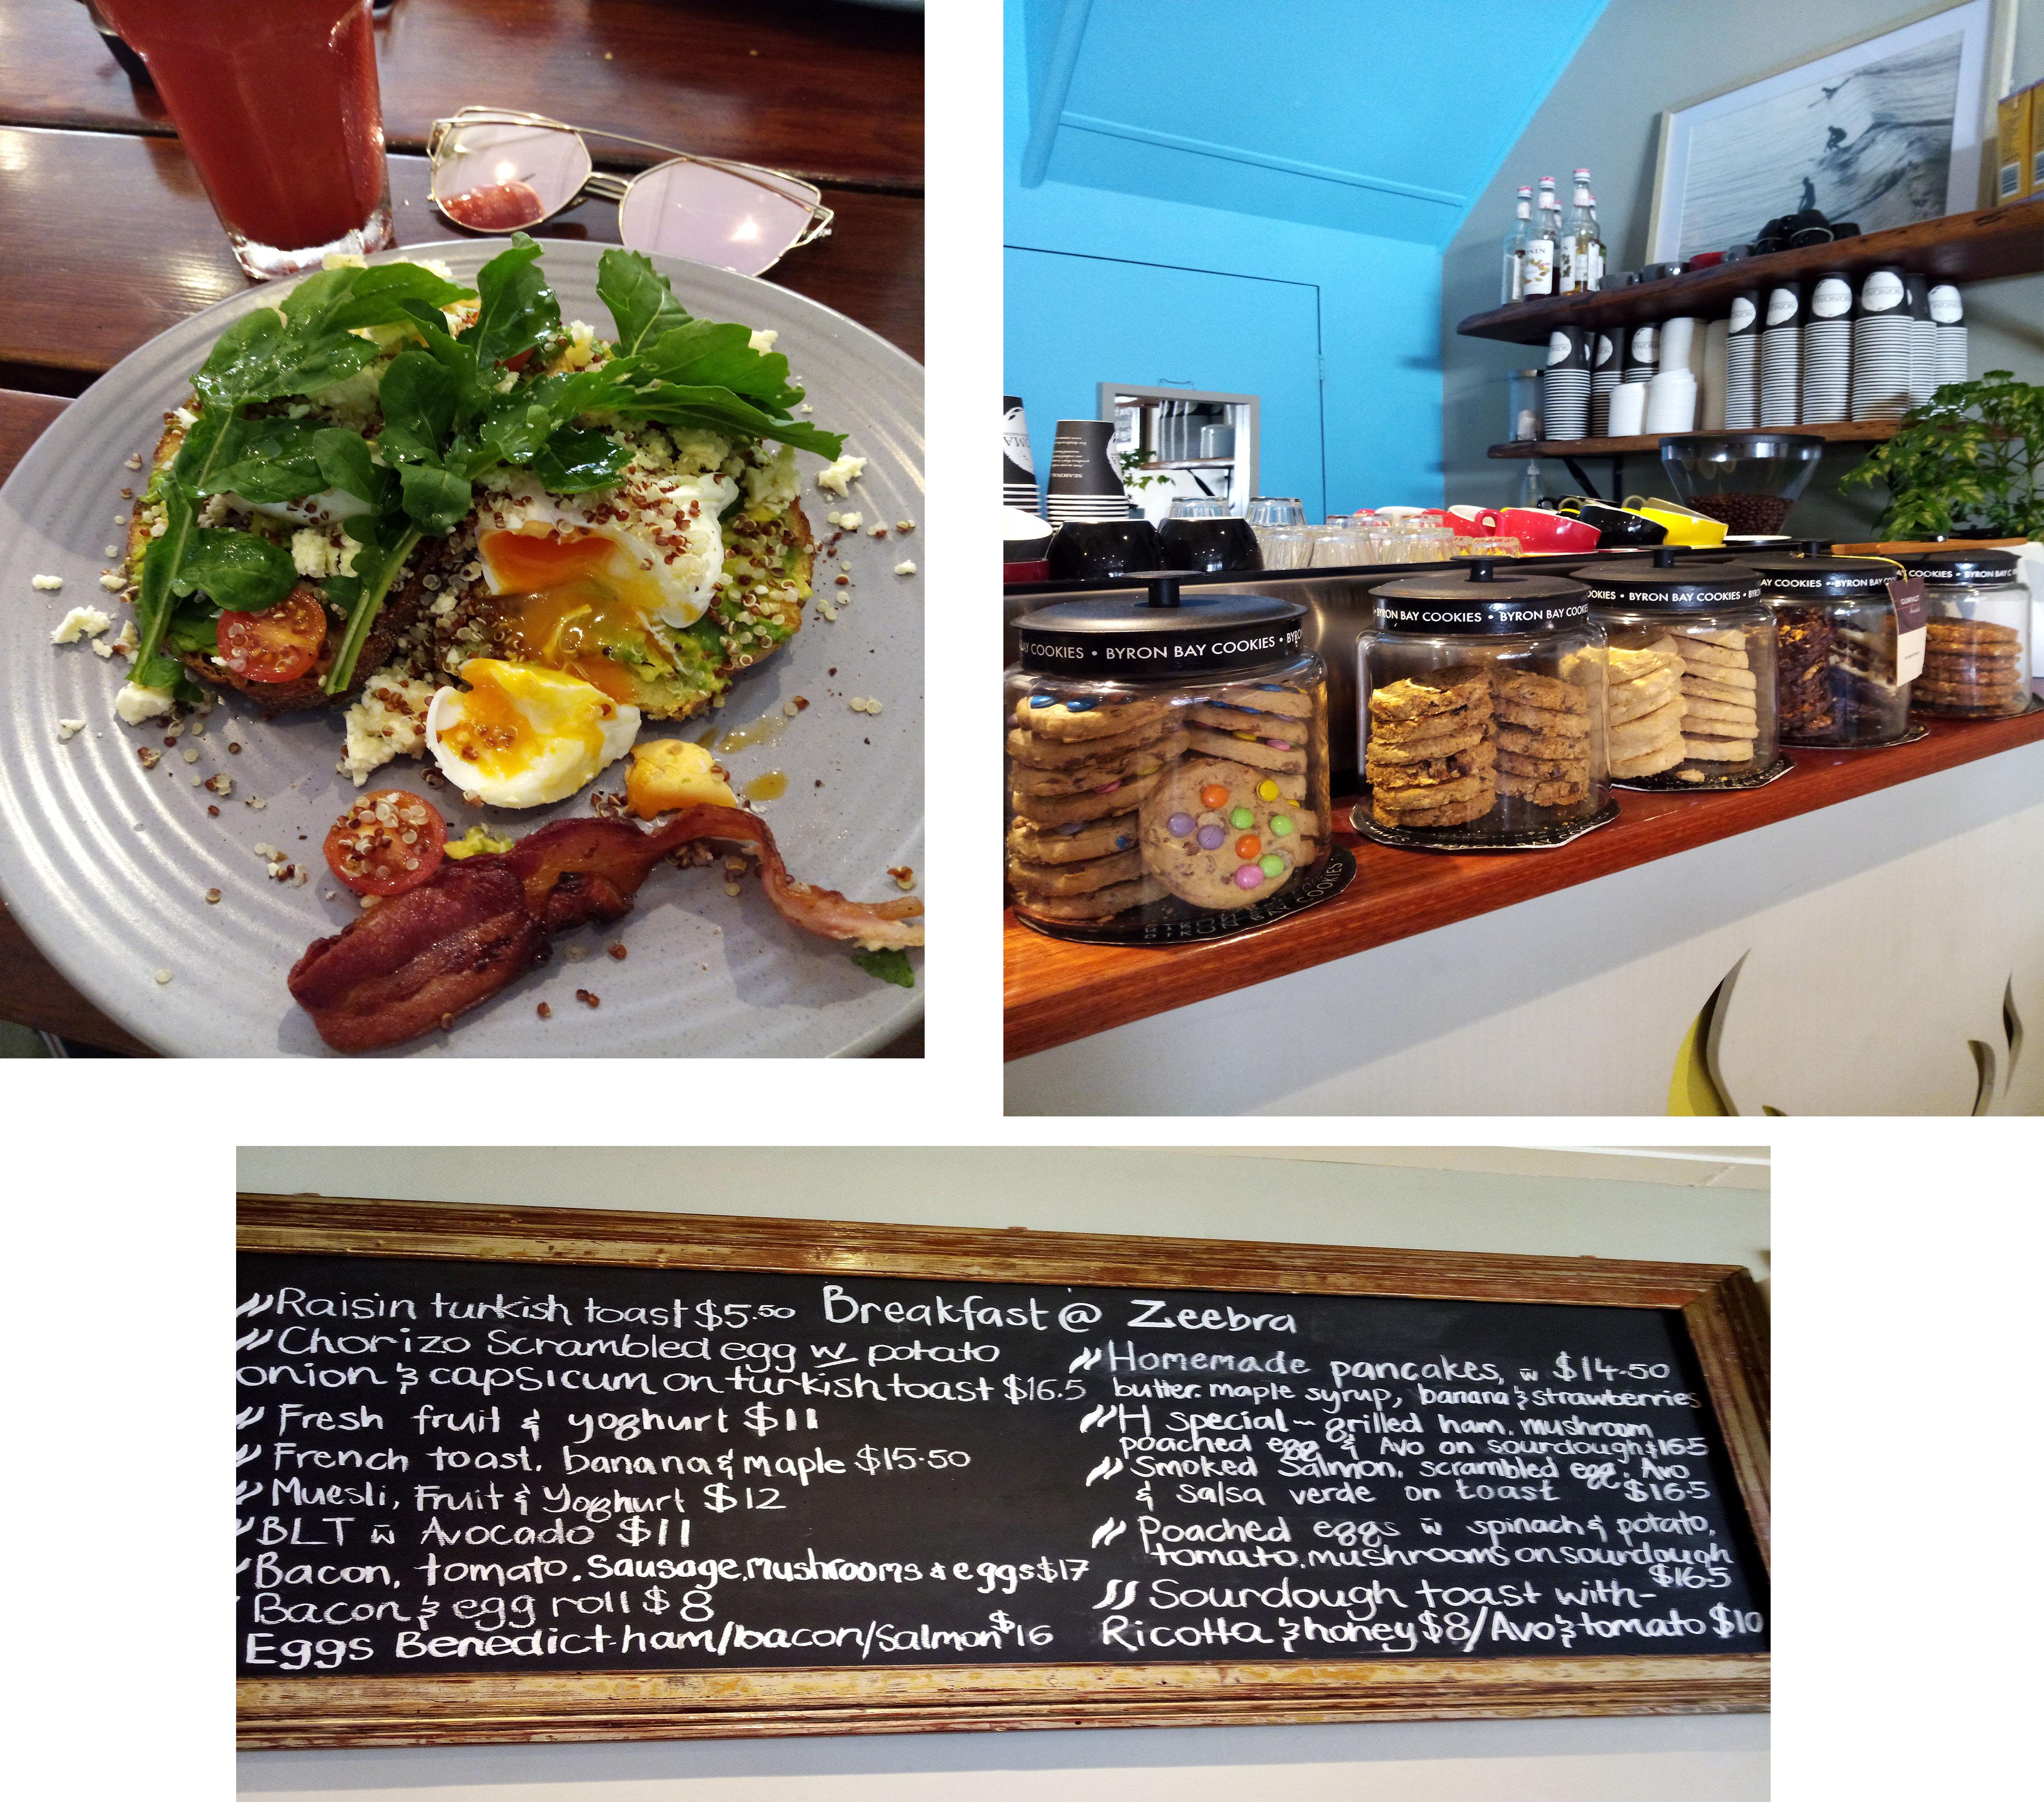 Zeebra Cafe